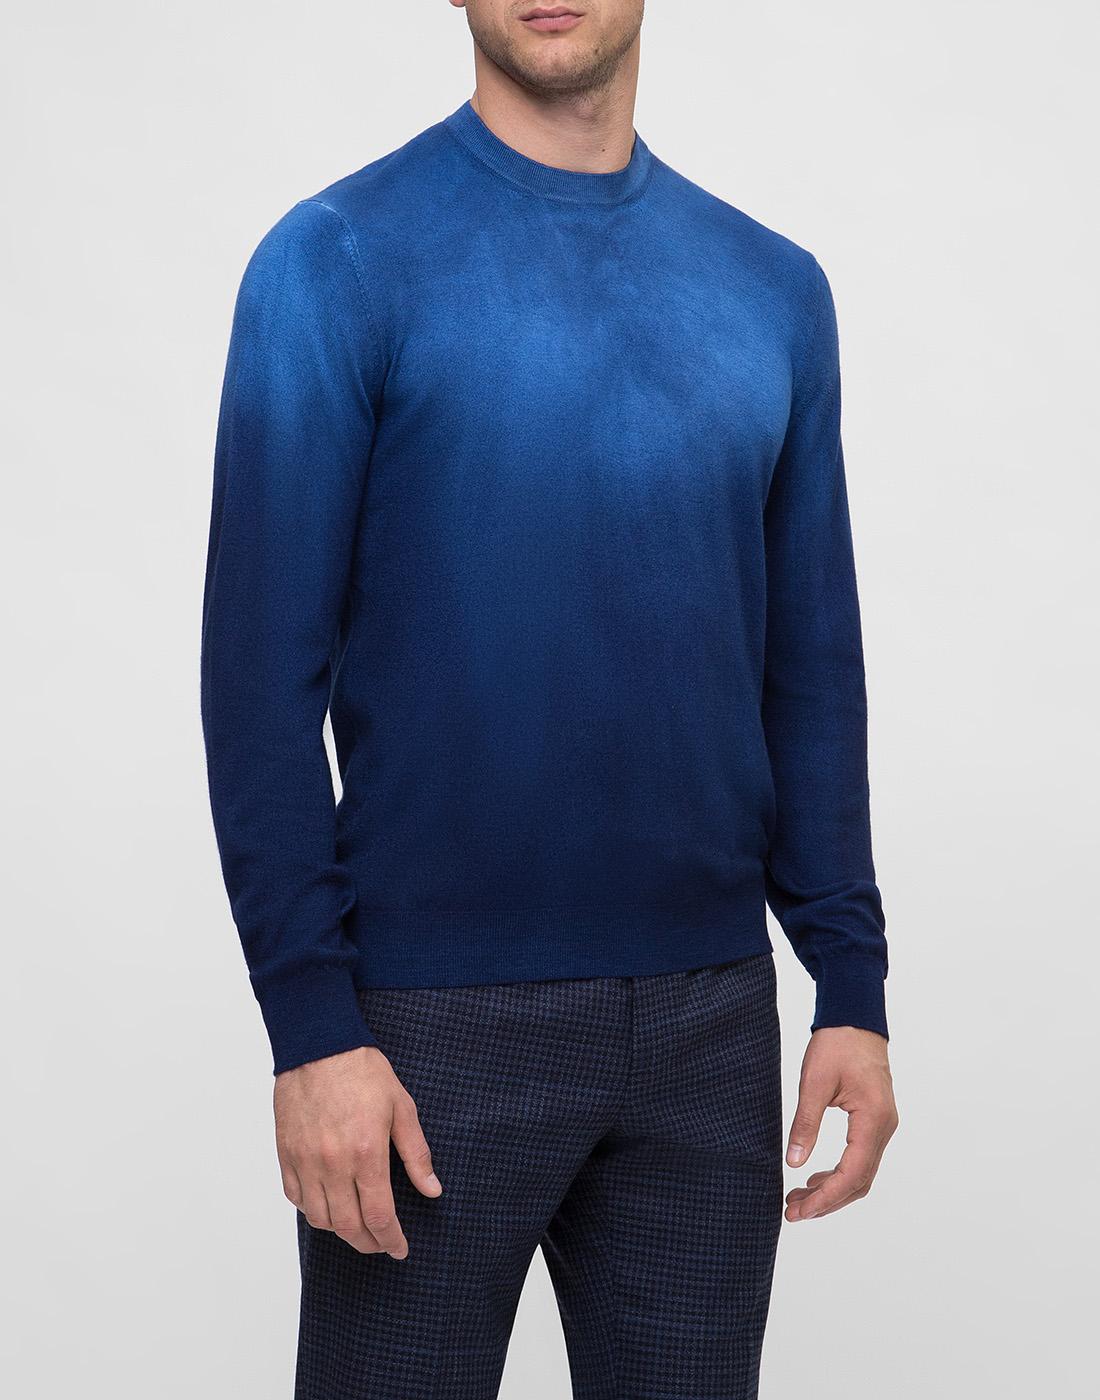 Мужской темно-синий джемпер  Bertolo S901638-3